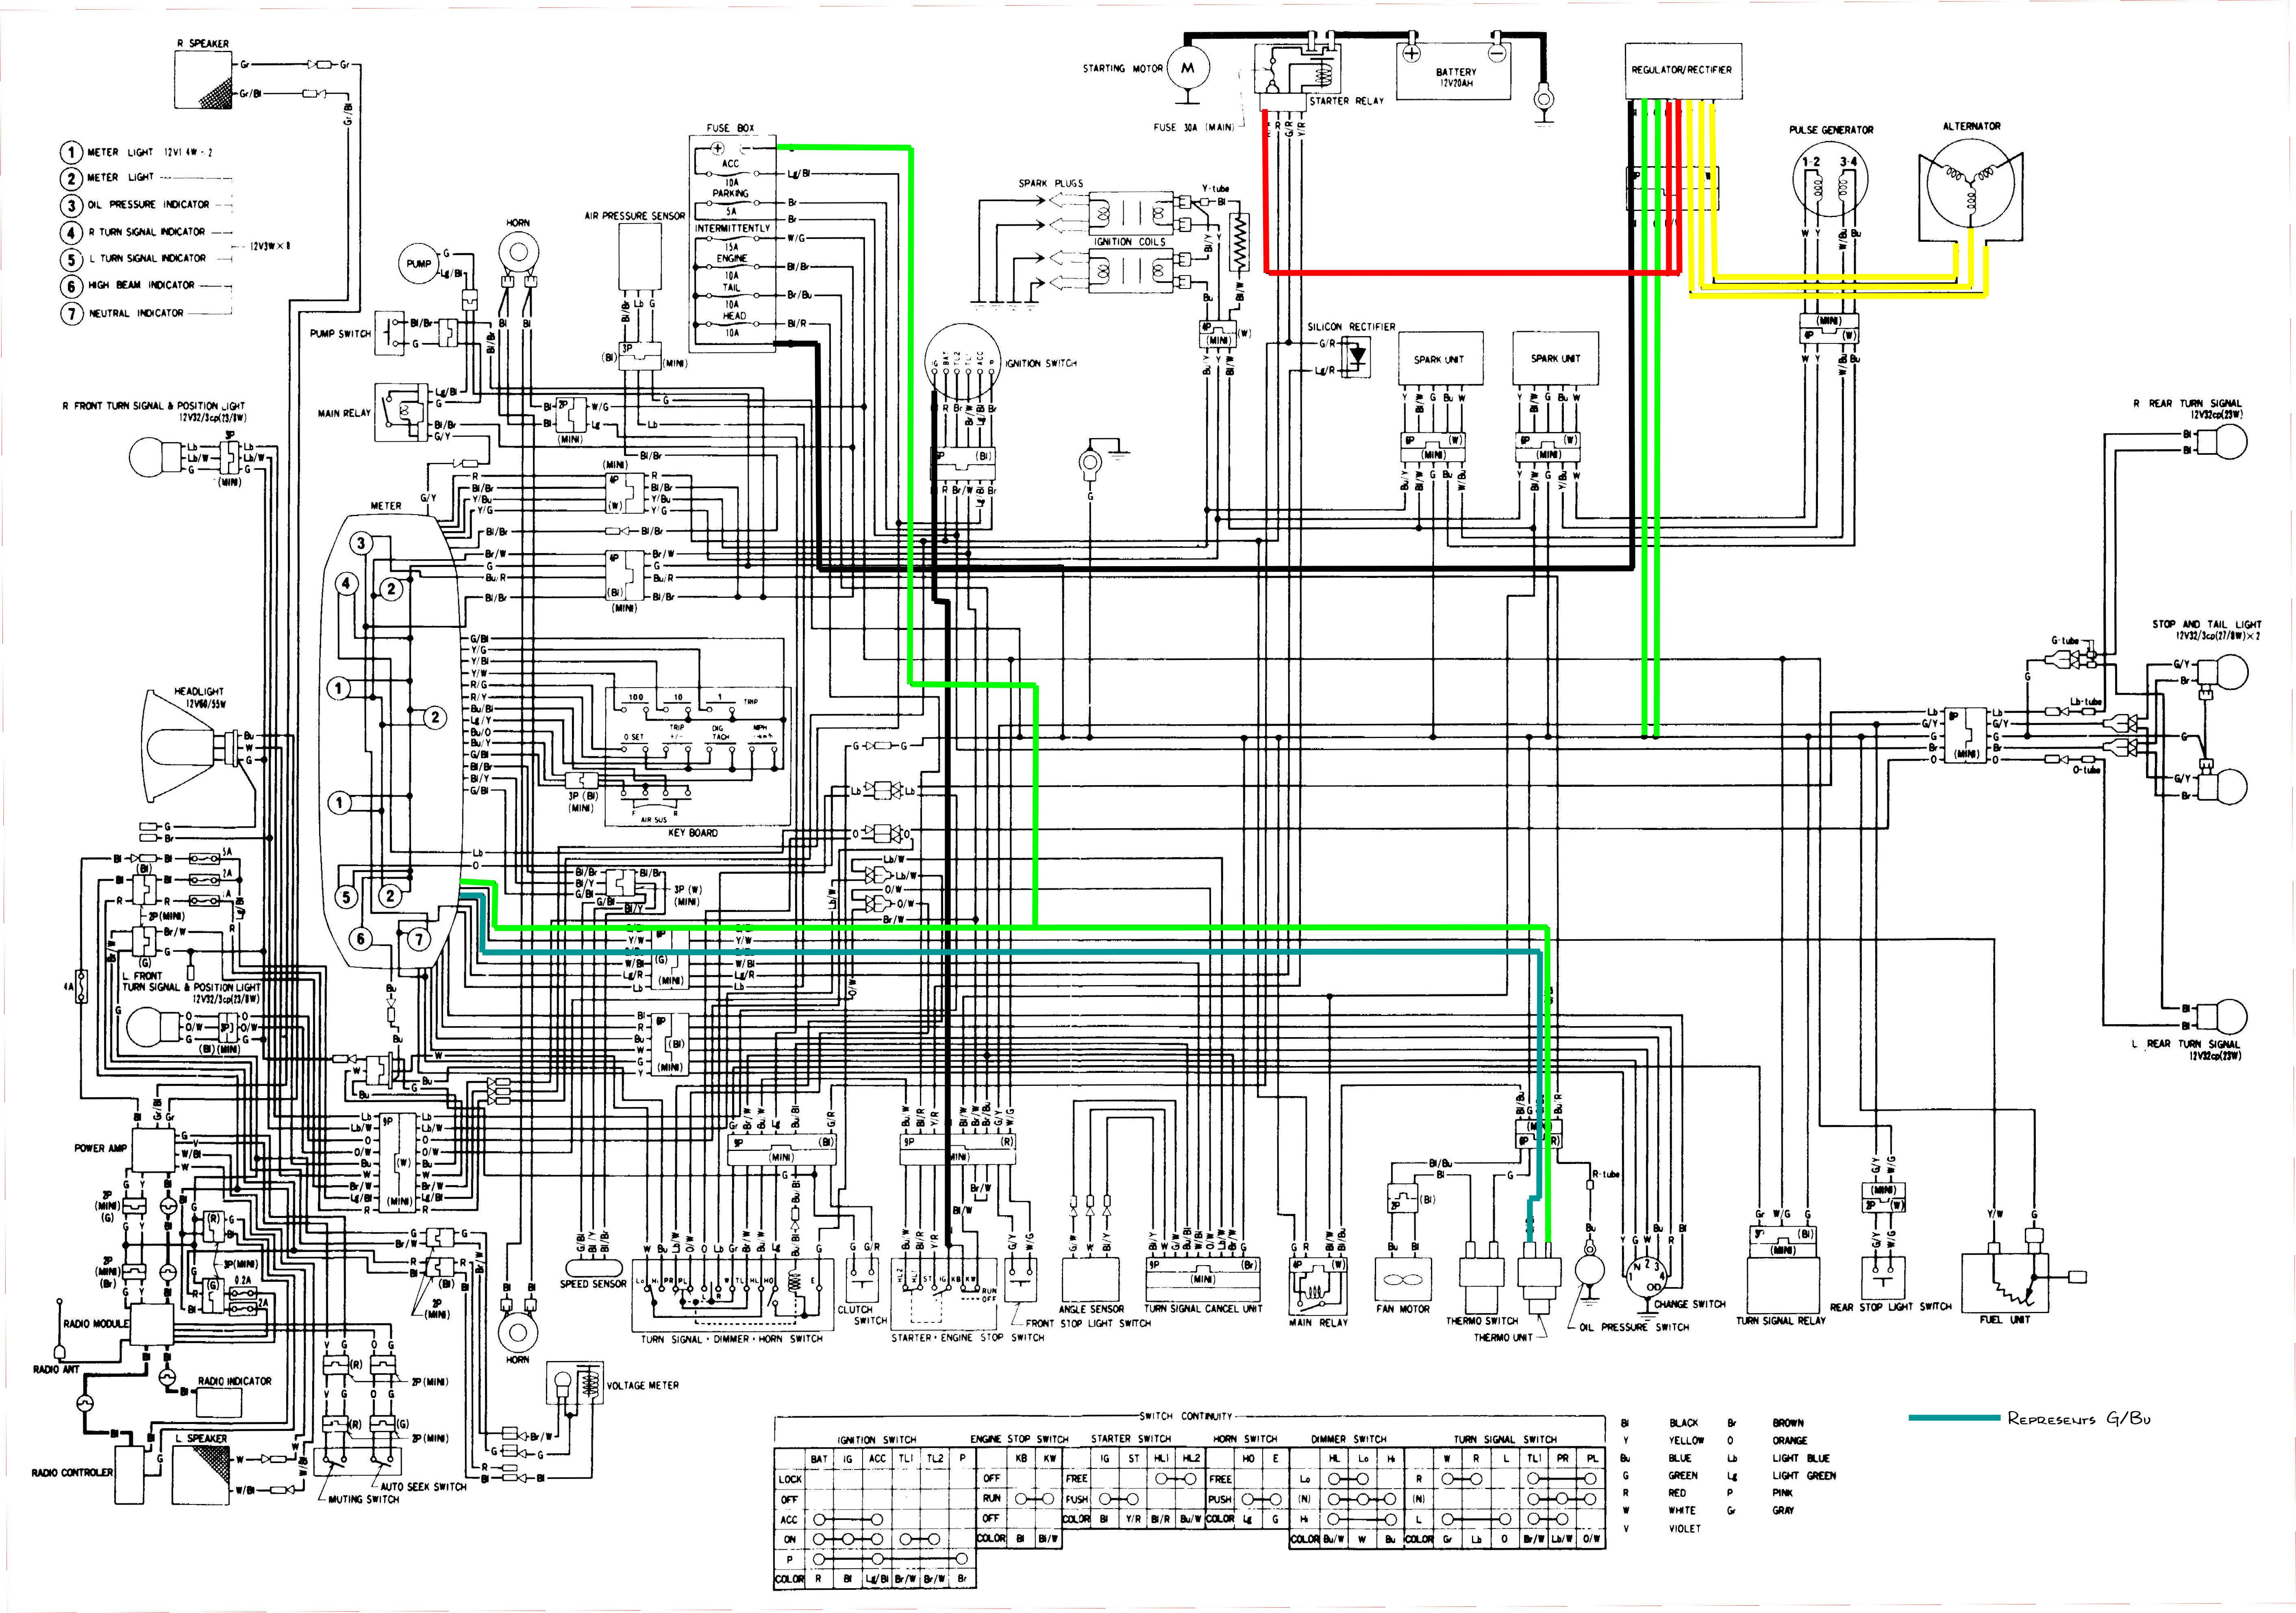 Wiring Diagram For Honda Goldwing